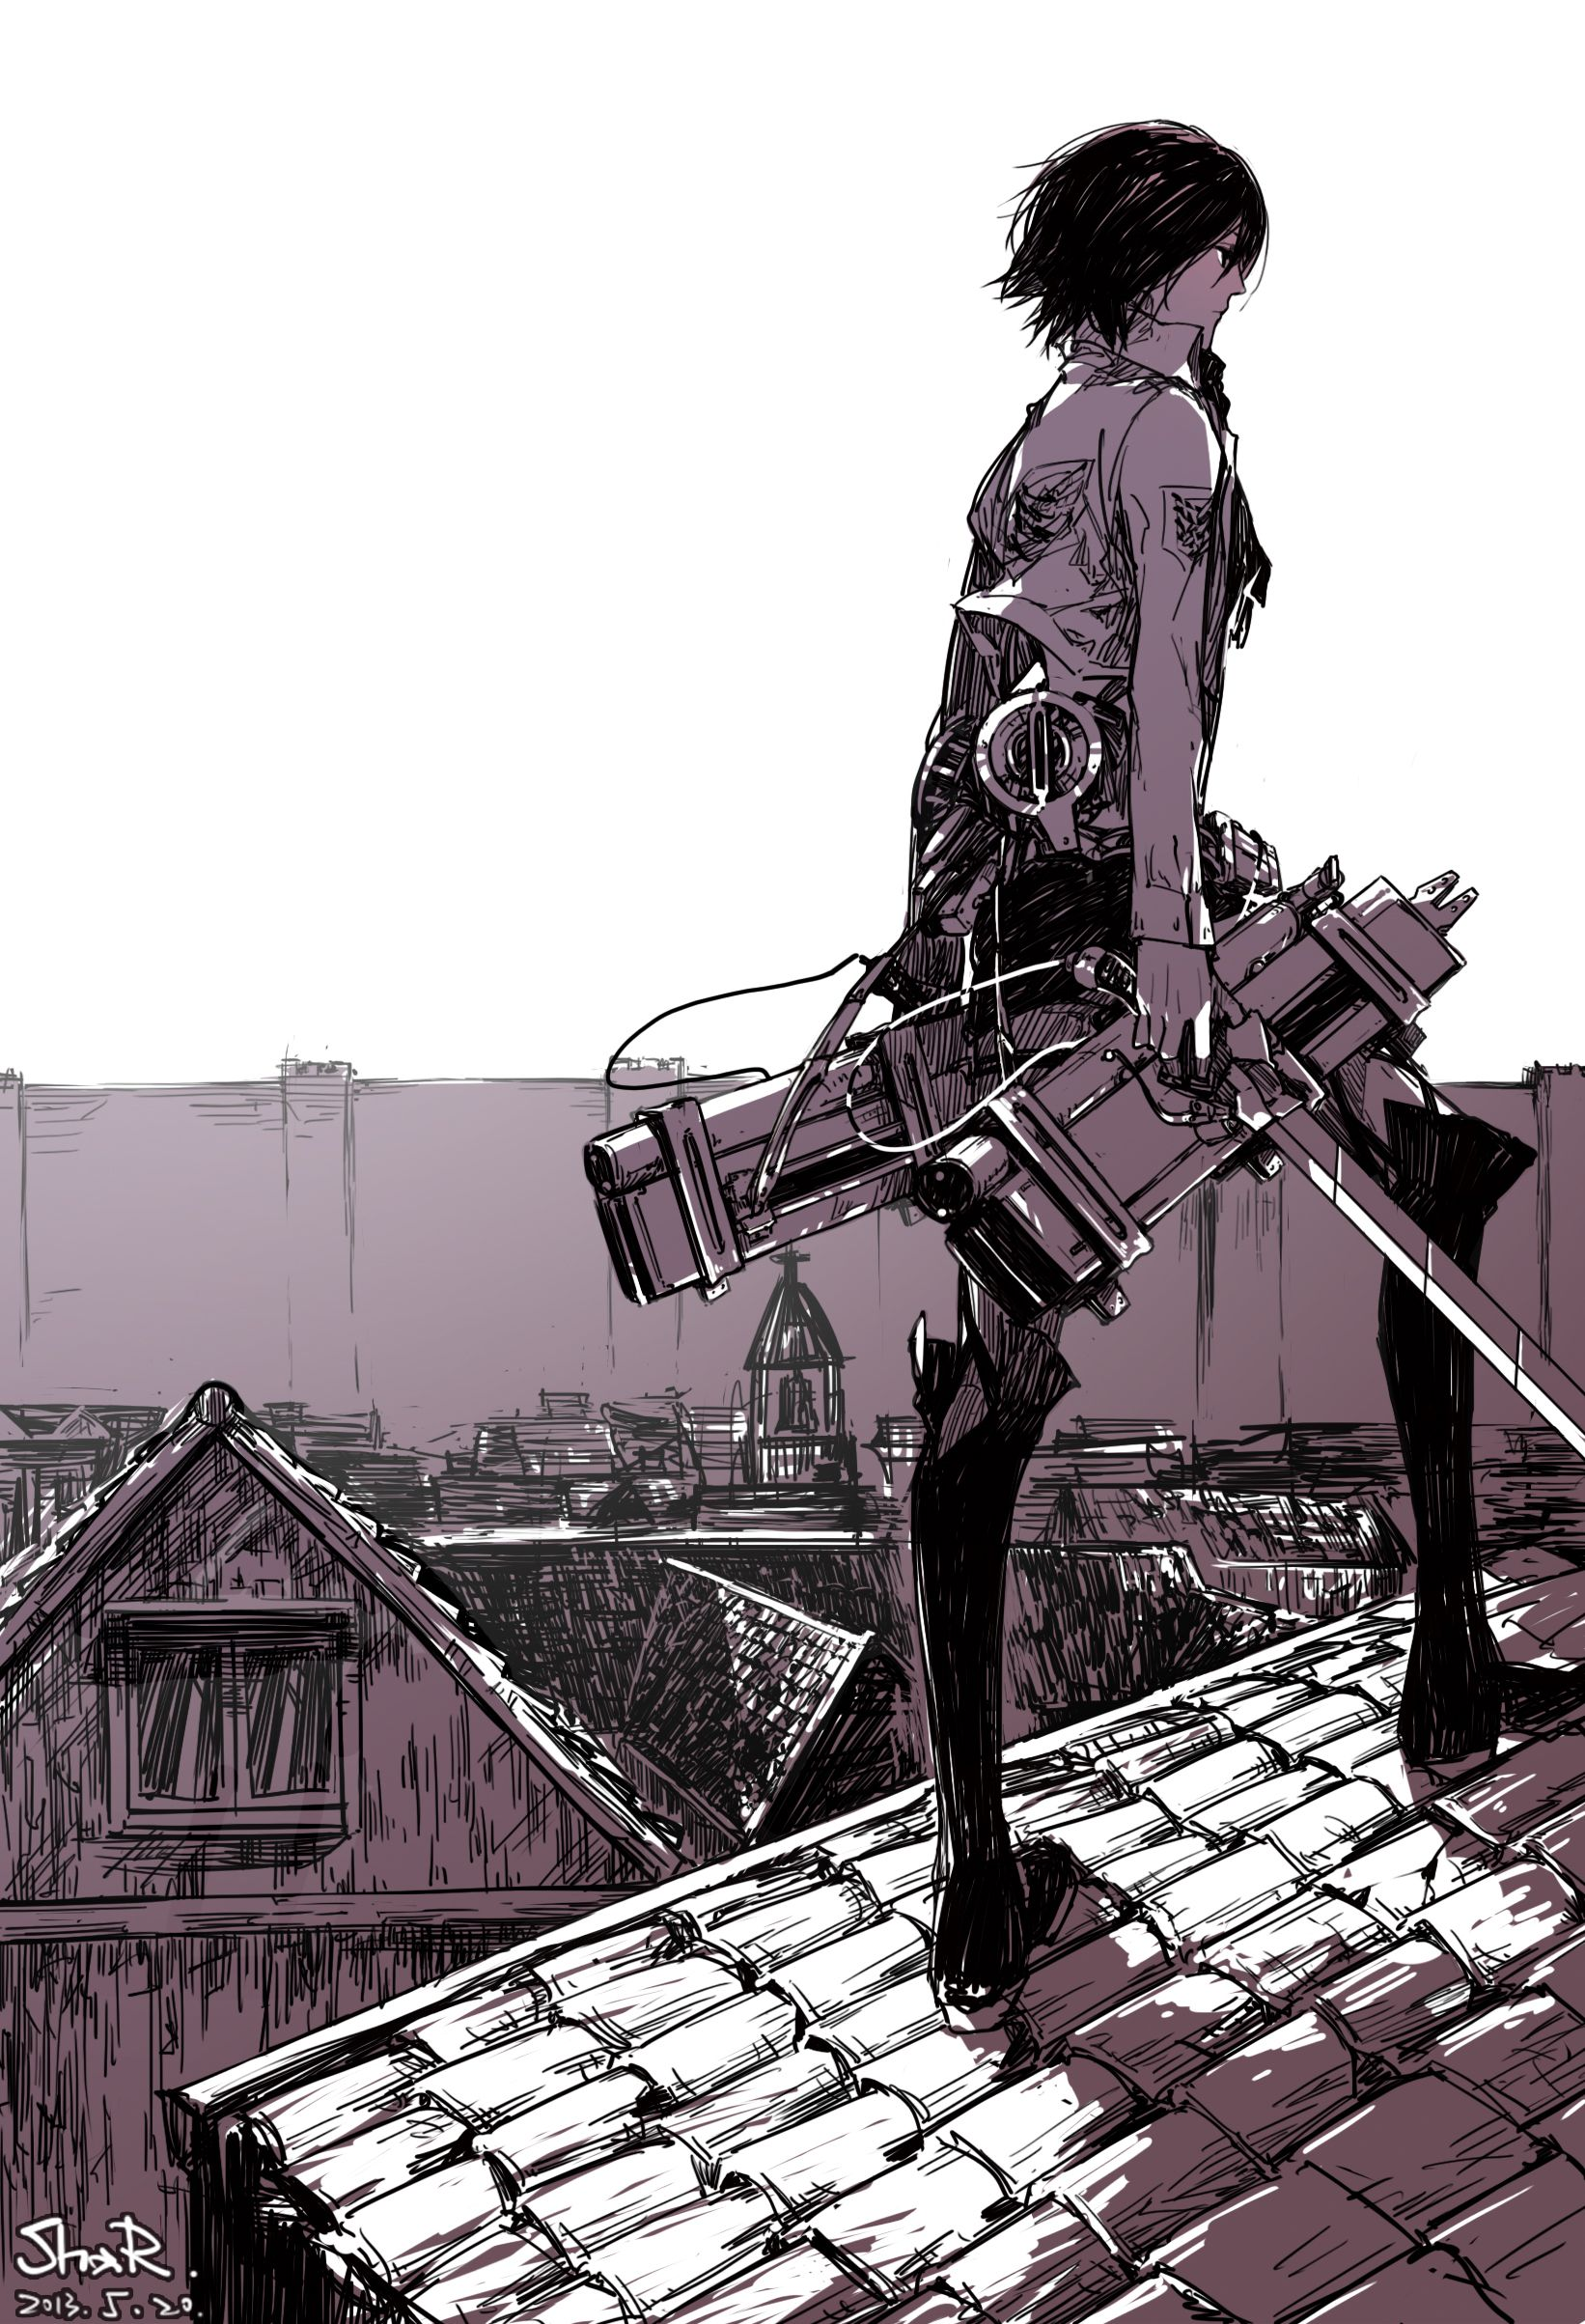 Pinterest Attack on titan anime, Attack on titan, Attack